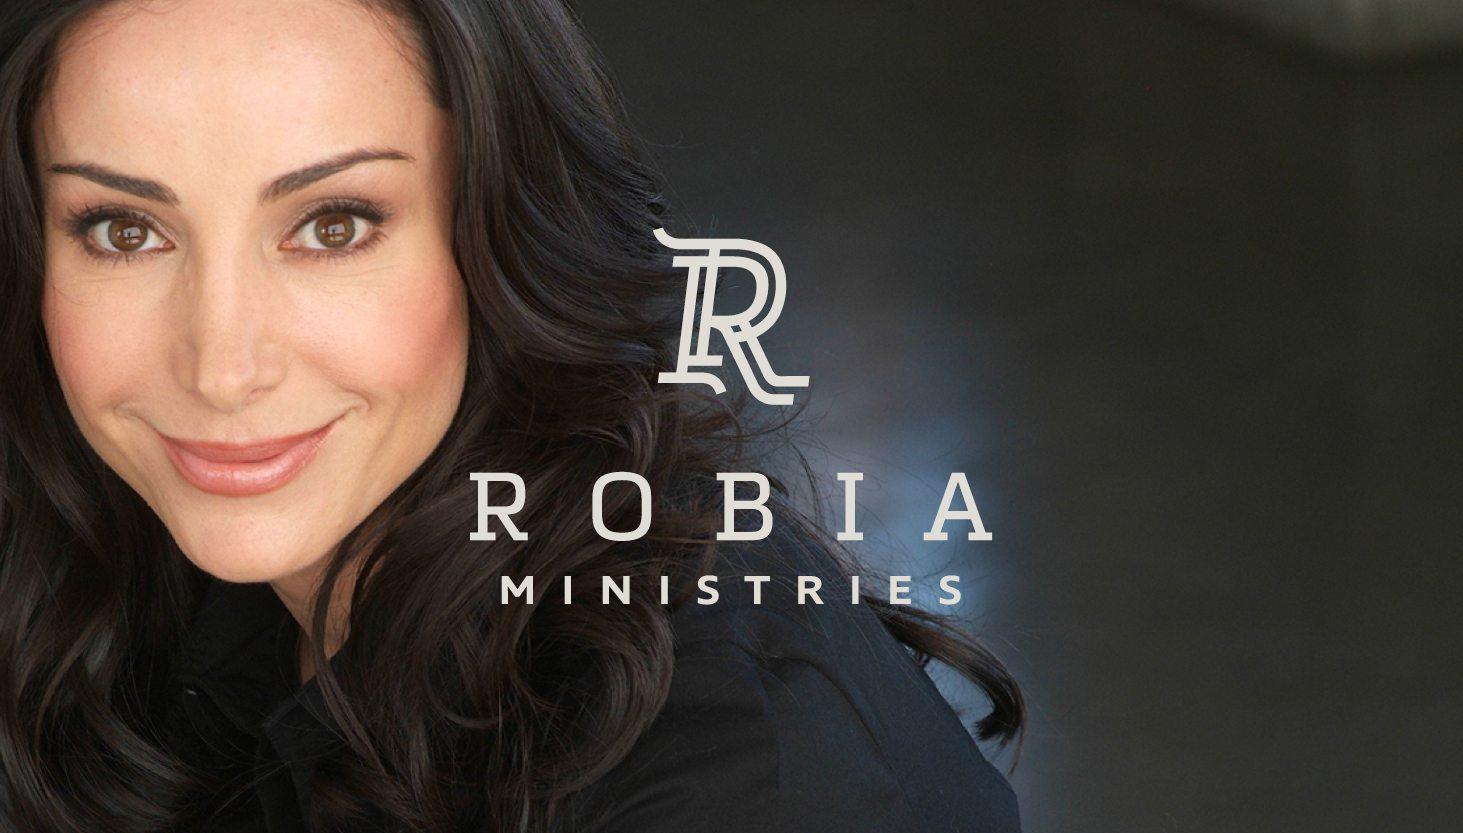 Mrs Smith Robia Ministries